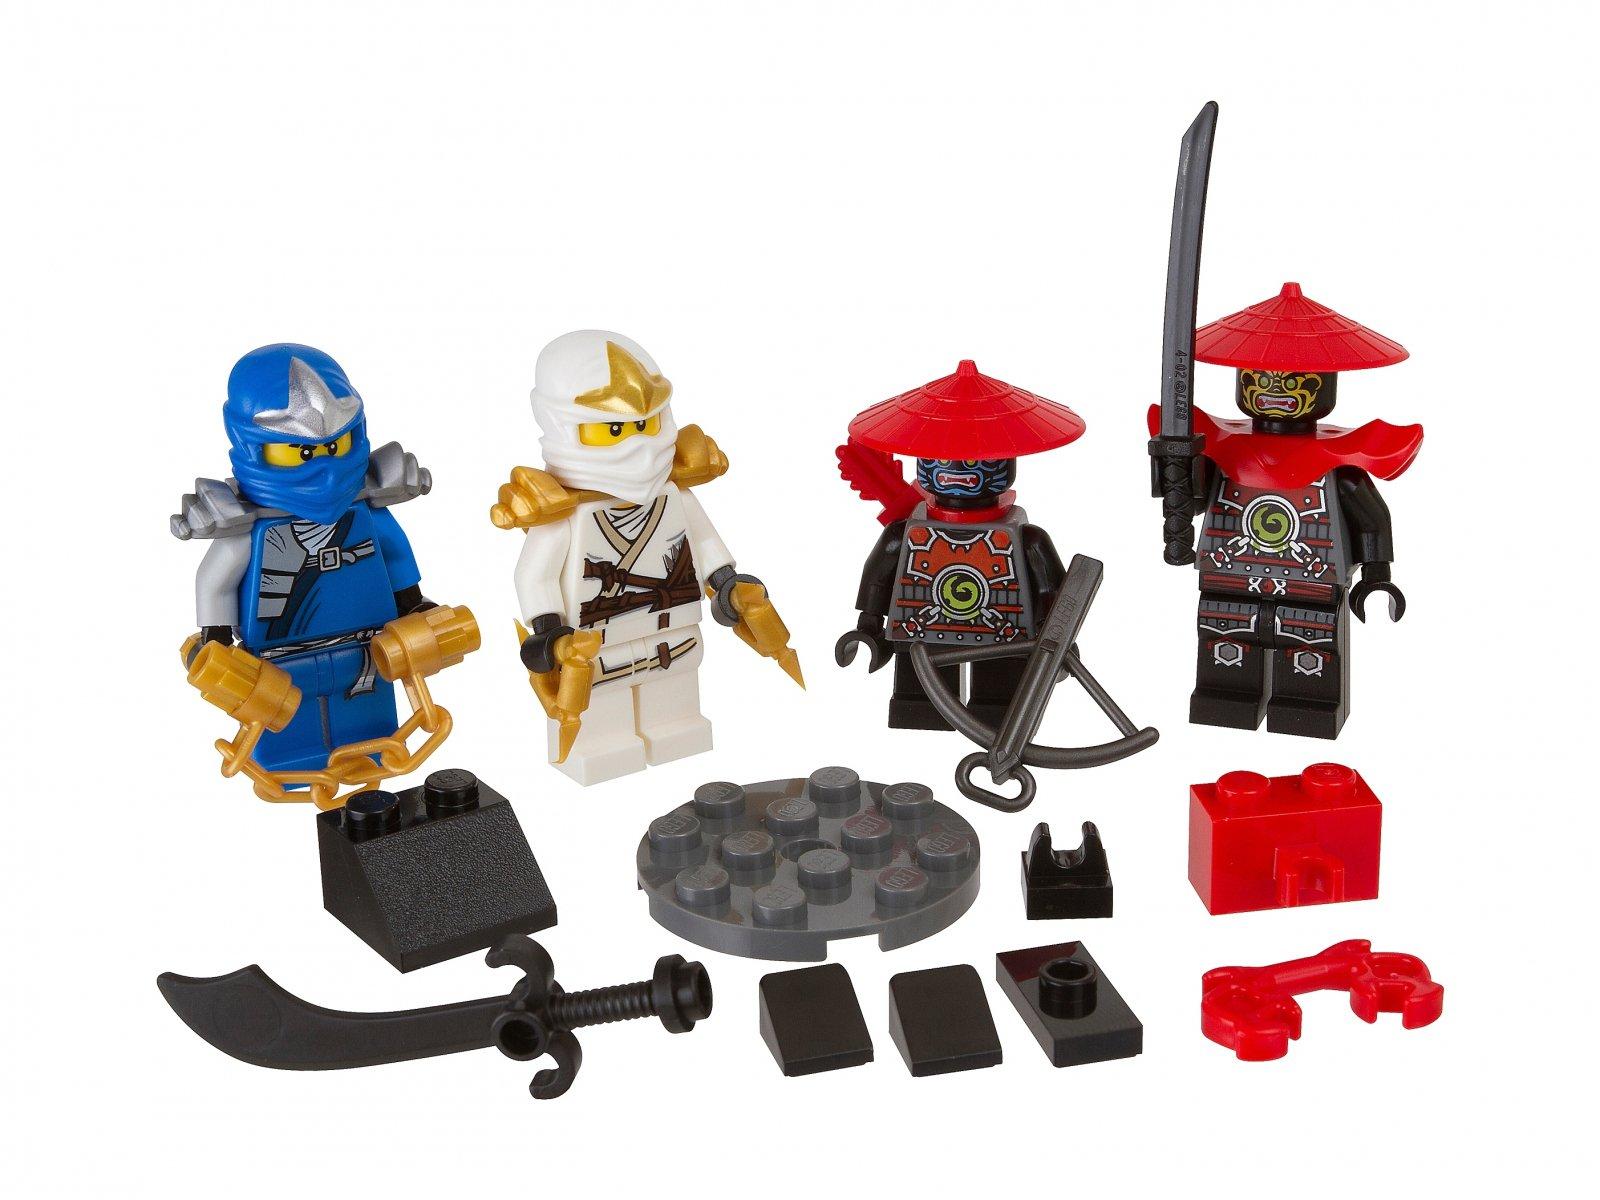 LEGO 850632 Ninjago® Samurai Accessory Set